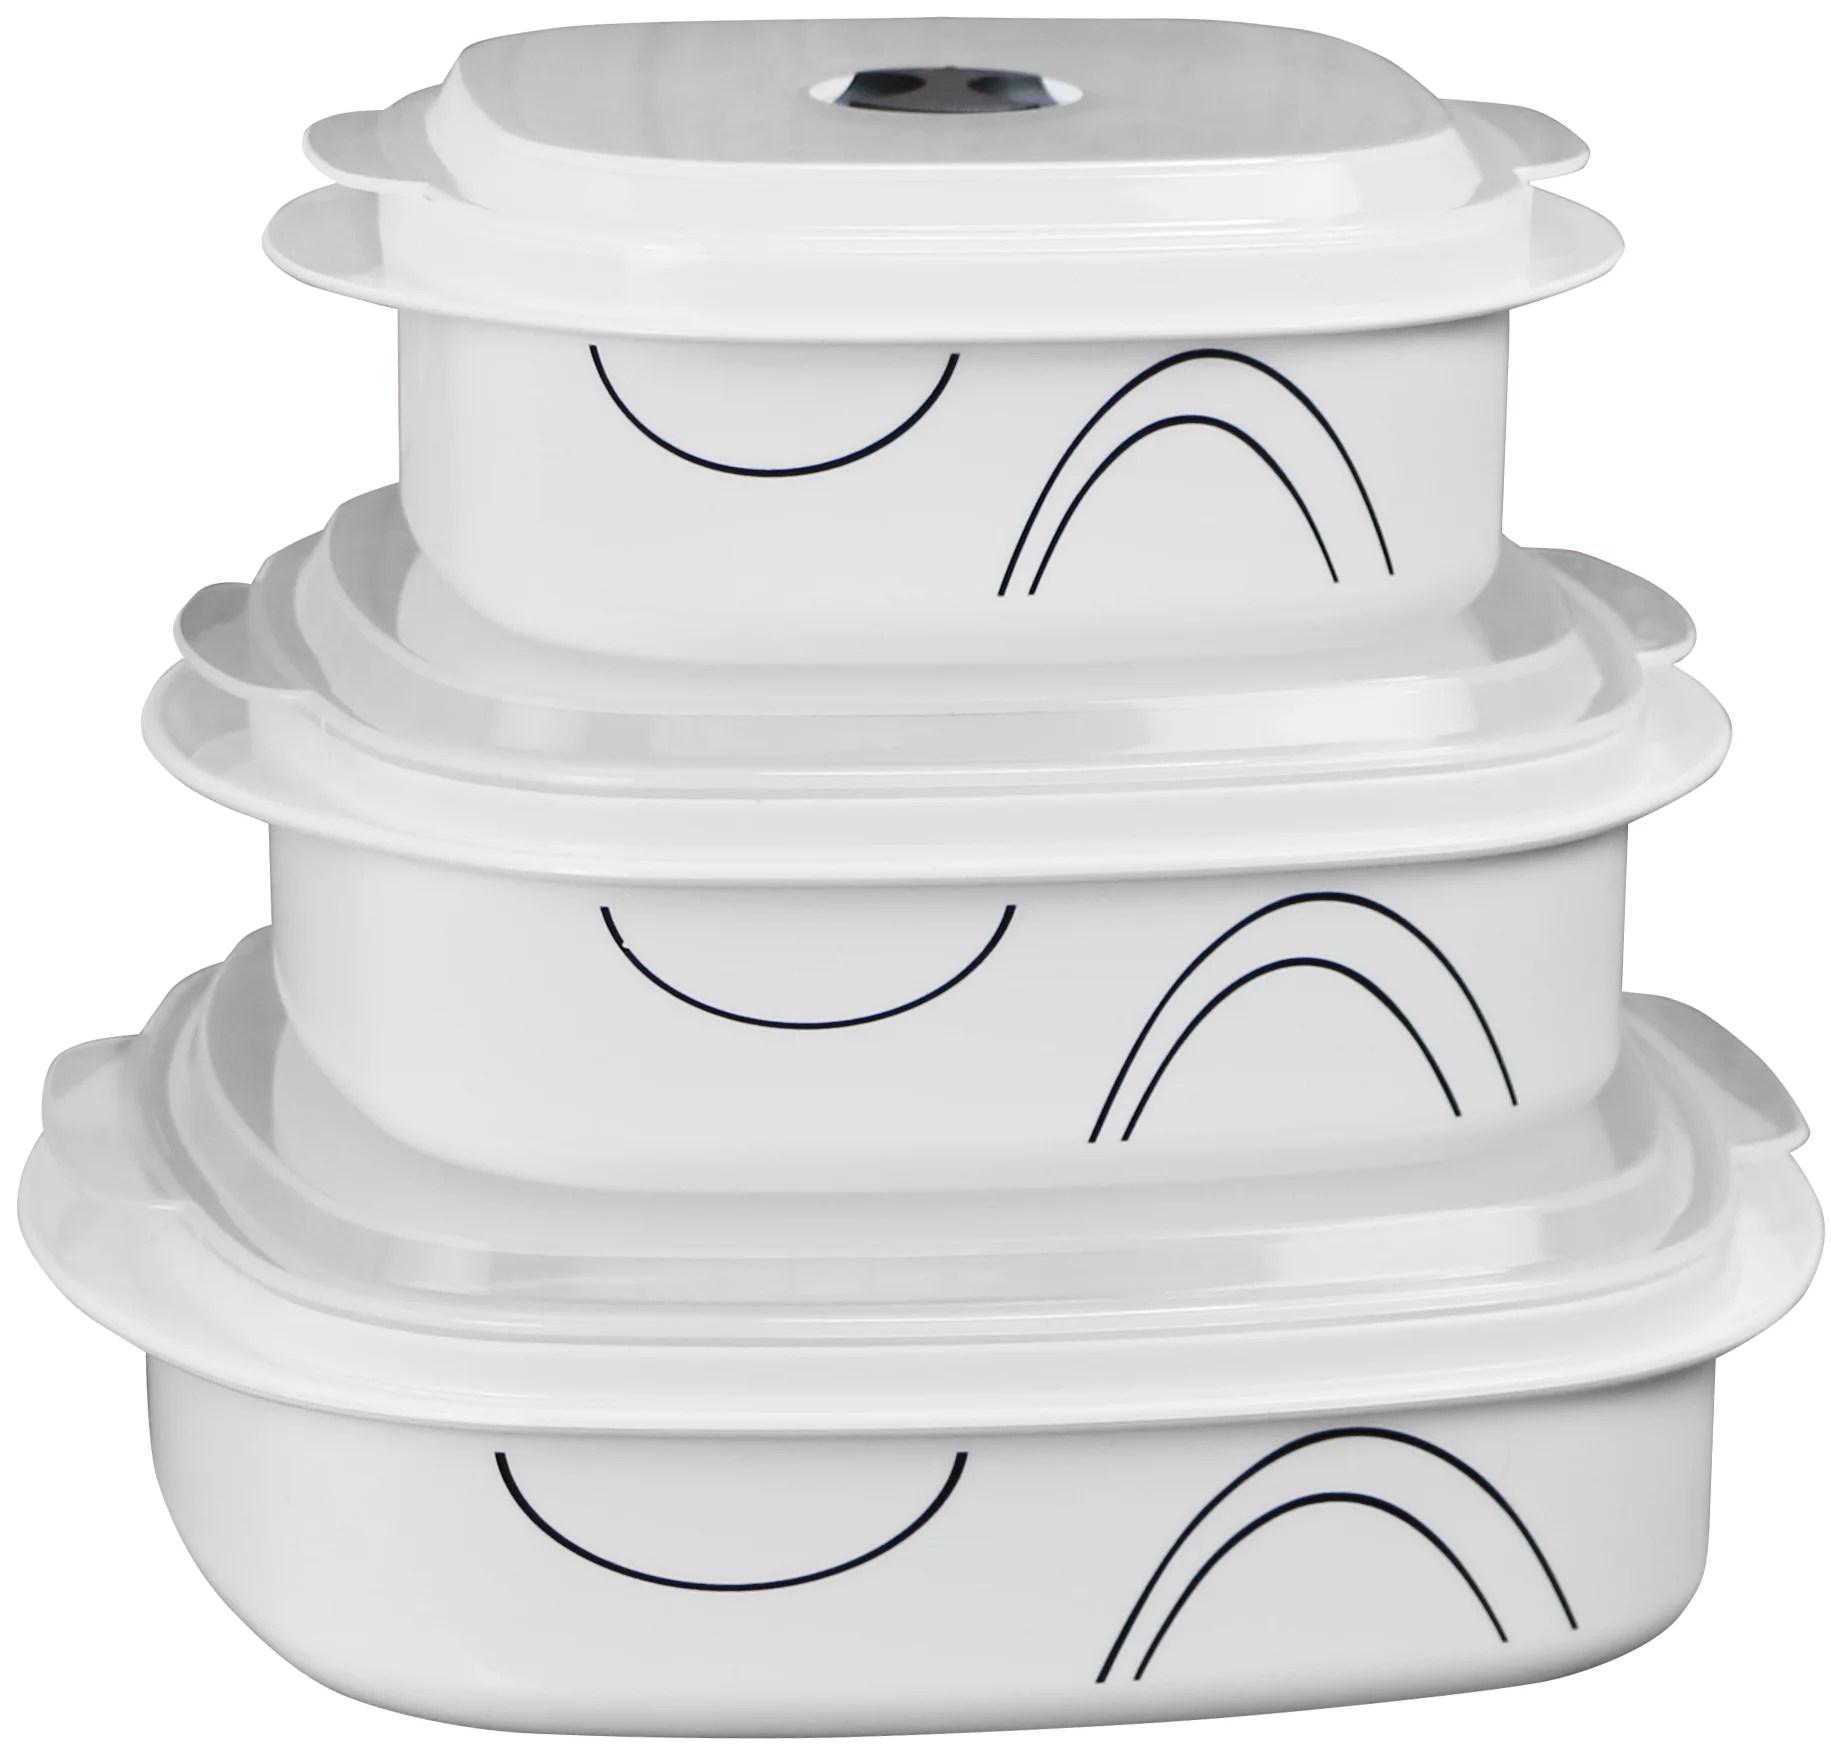 corelle coordinates 6 piece microwave safe cookware storage set simple lines walmart com